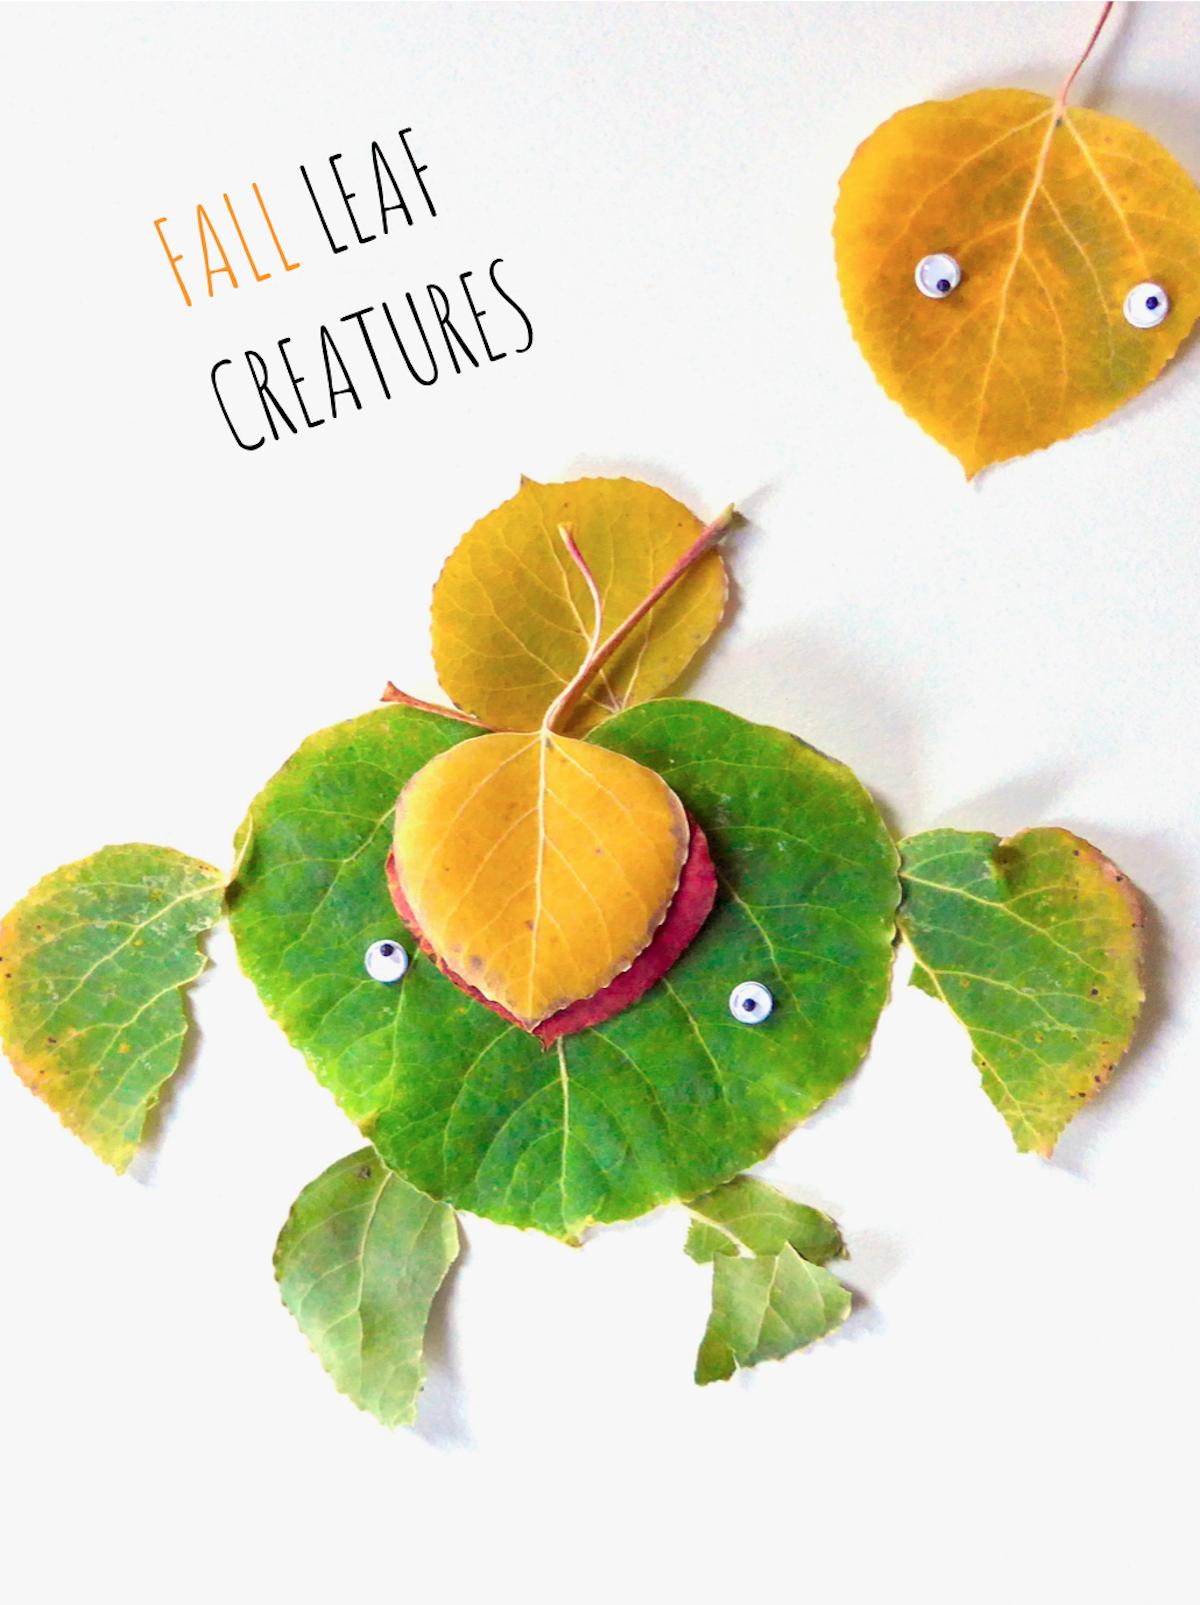 Fall Leaf Creatures